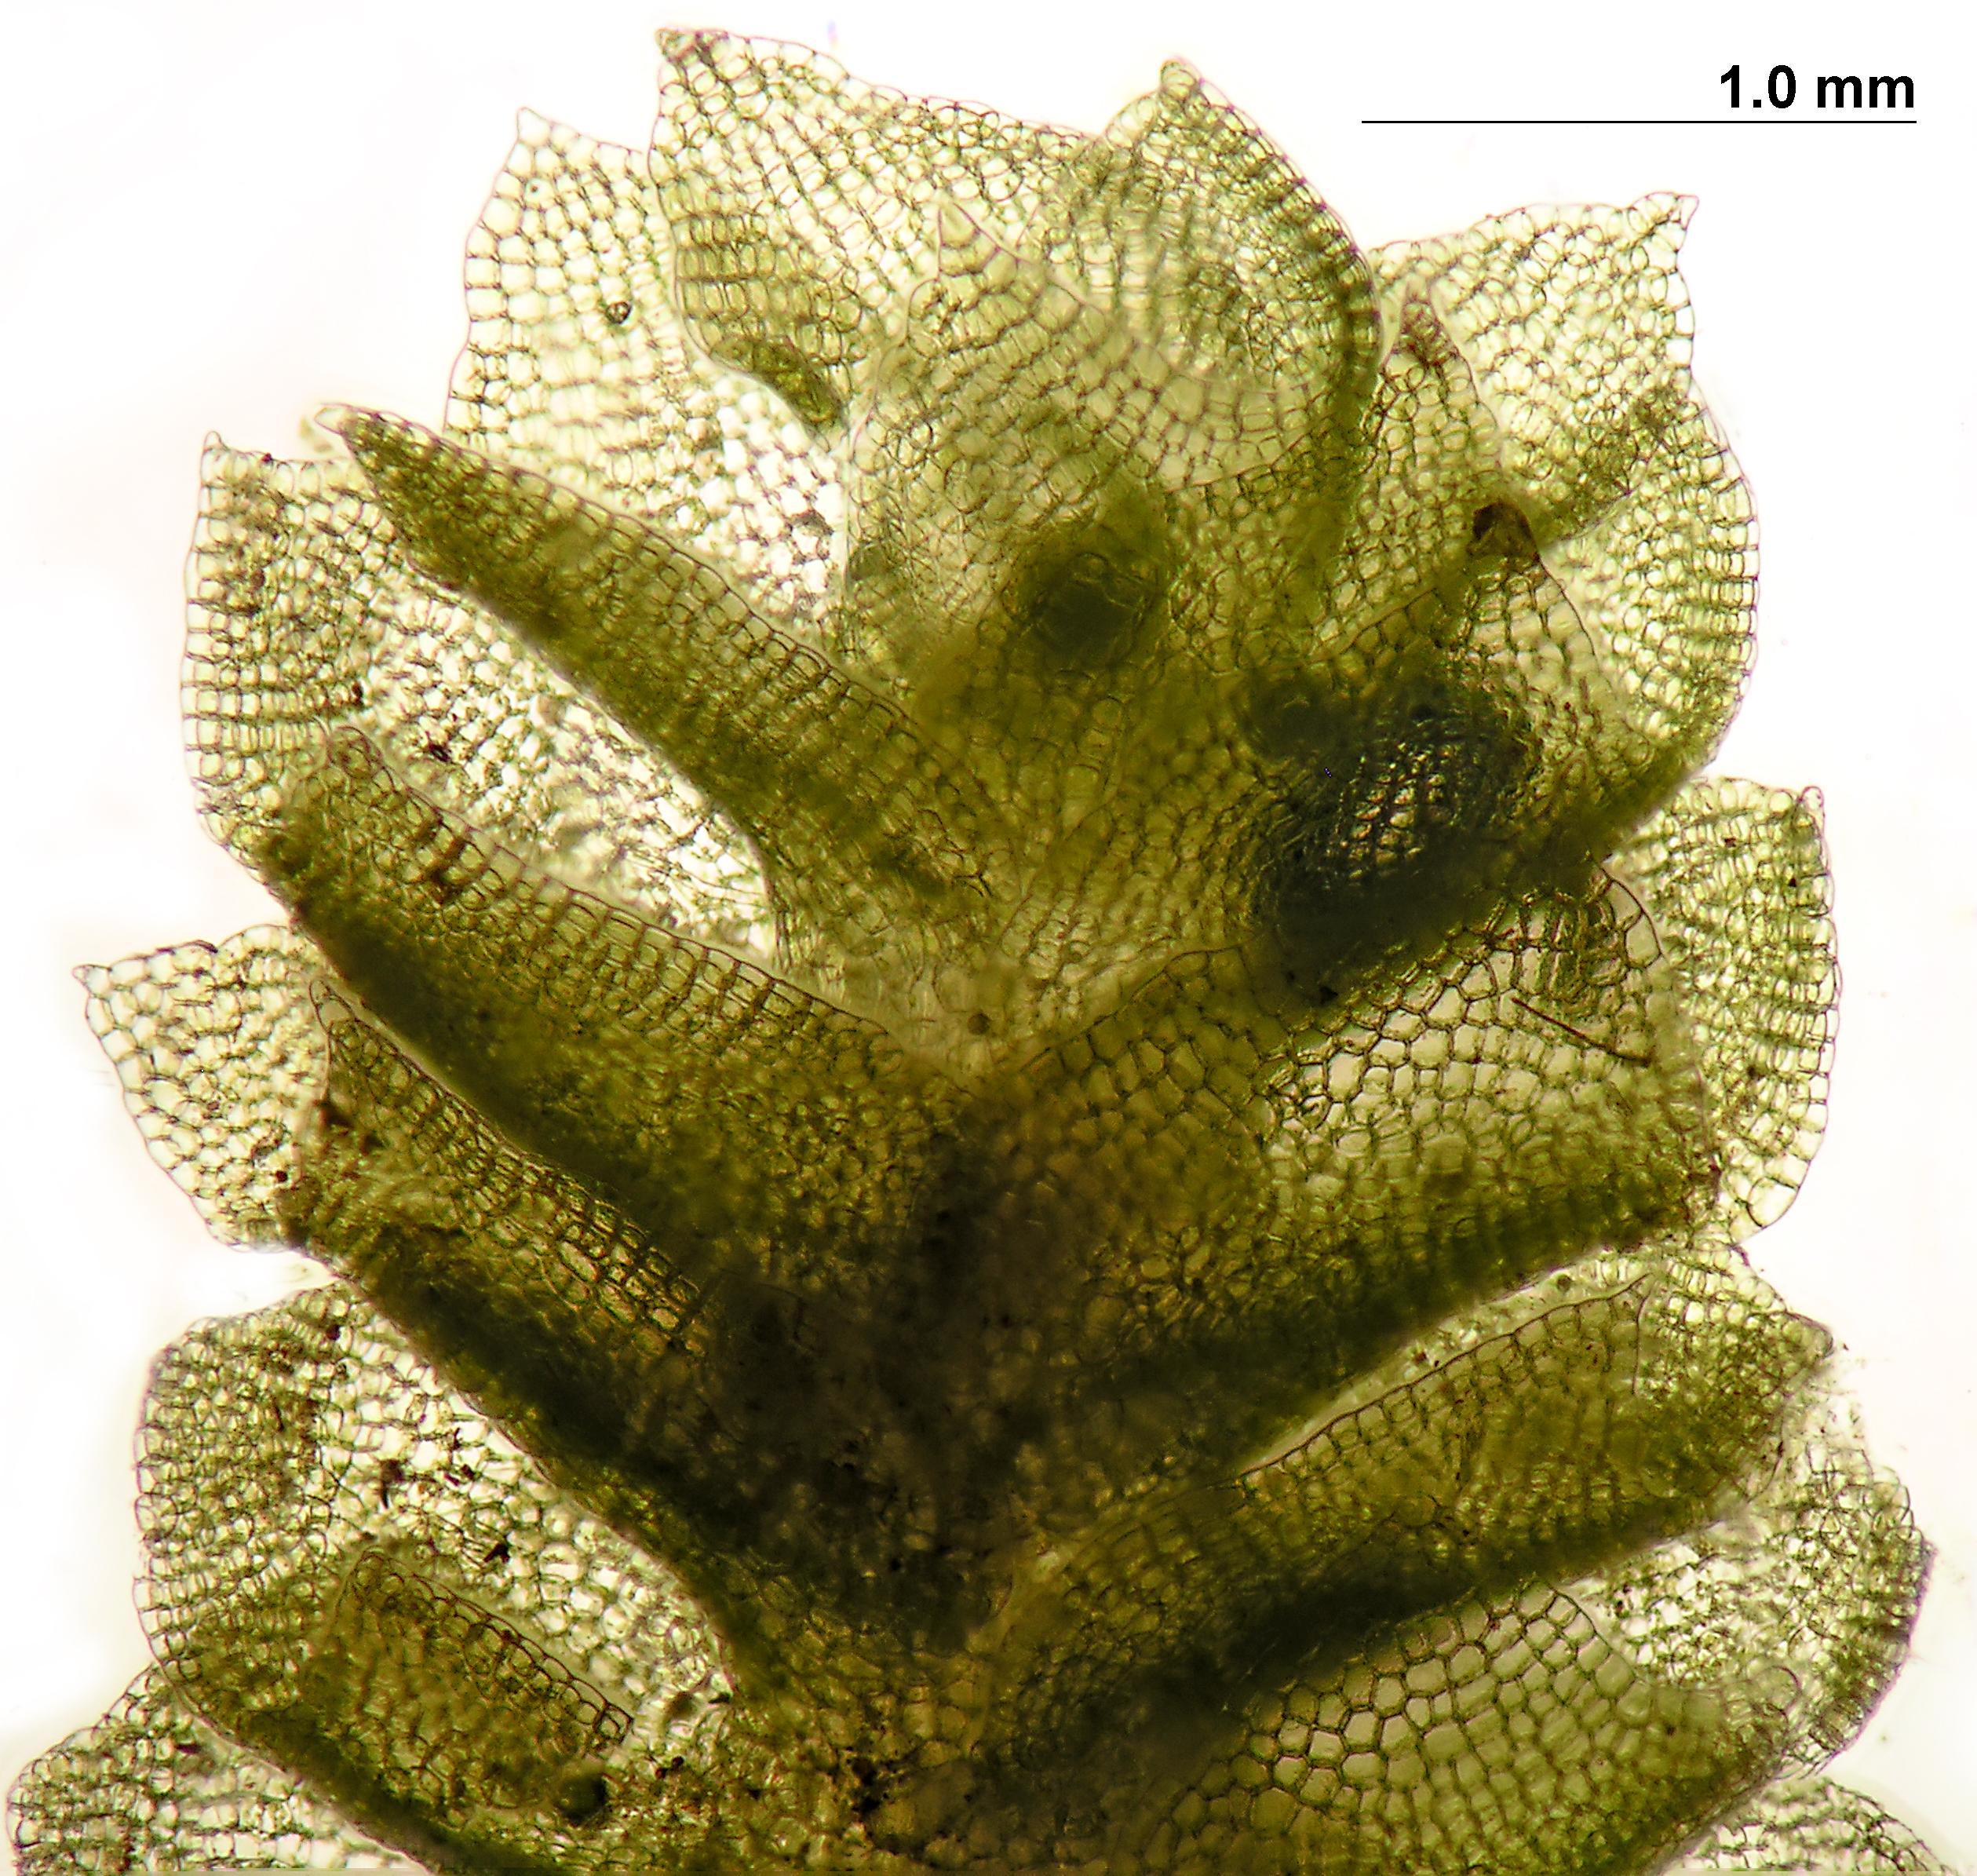 Schofieldia monticola - shoot